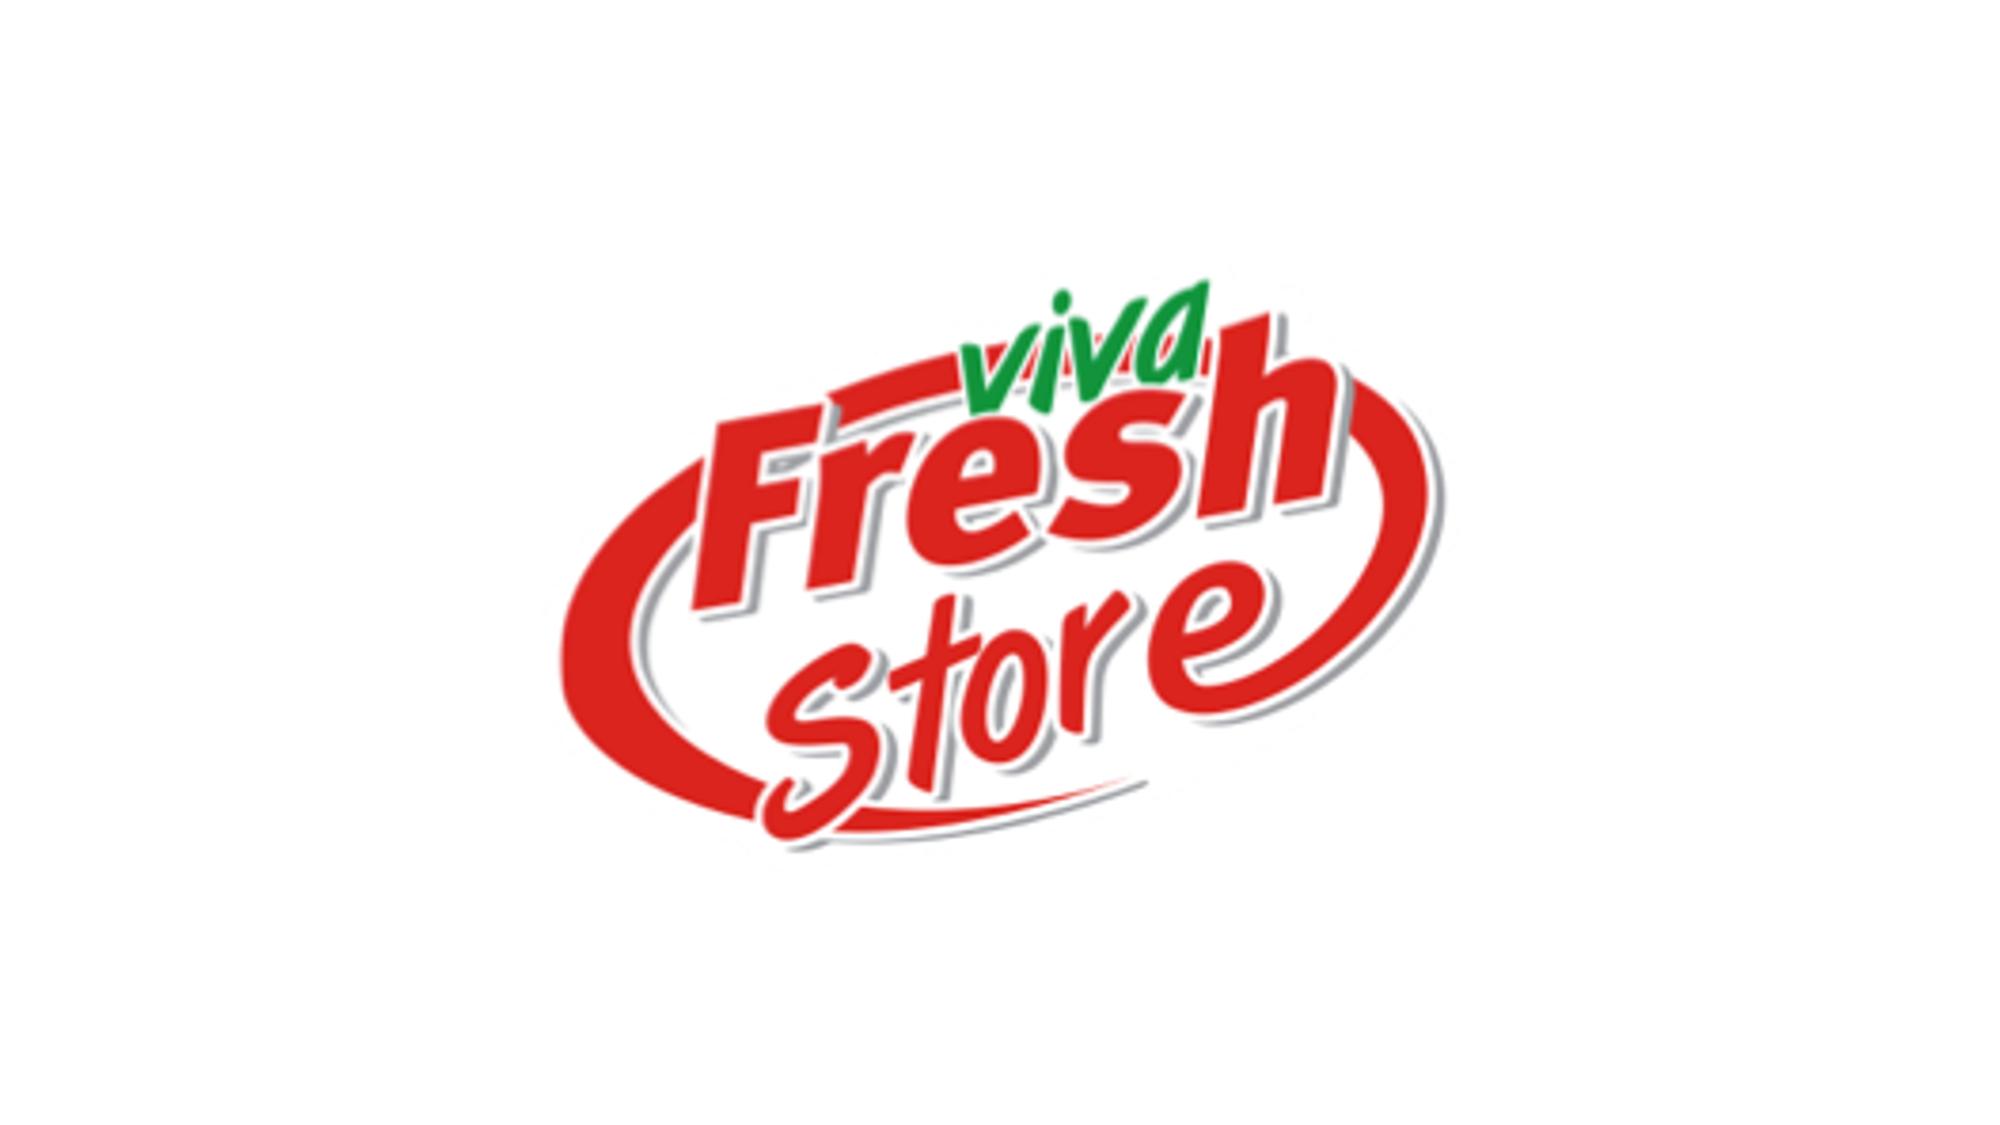 VivaFresh